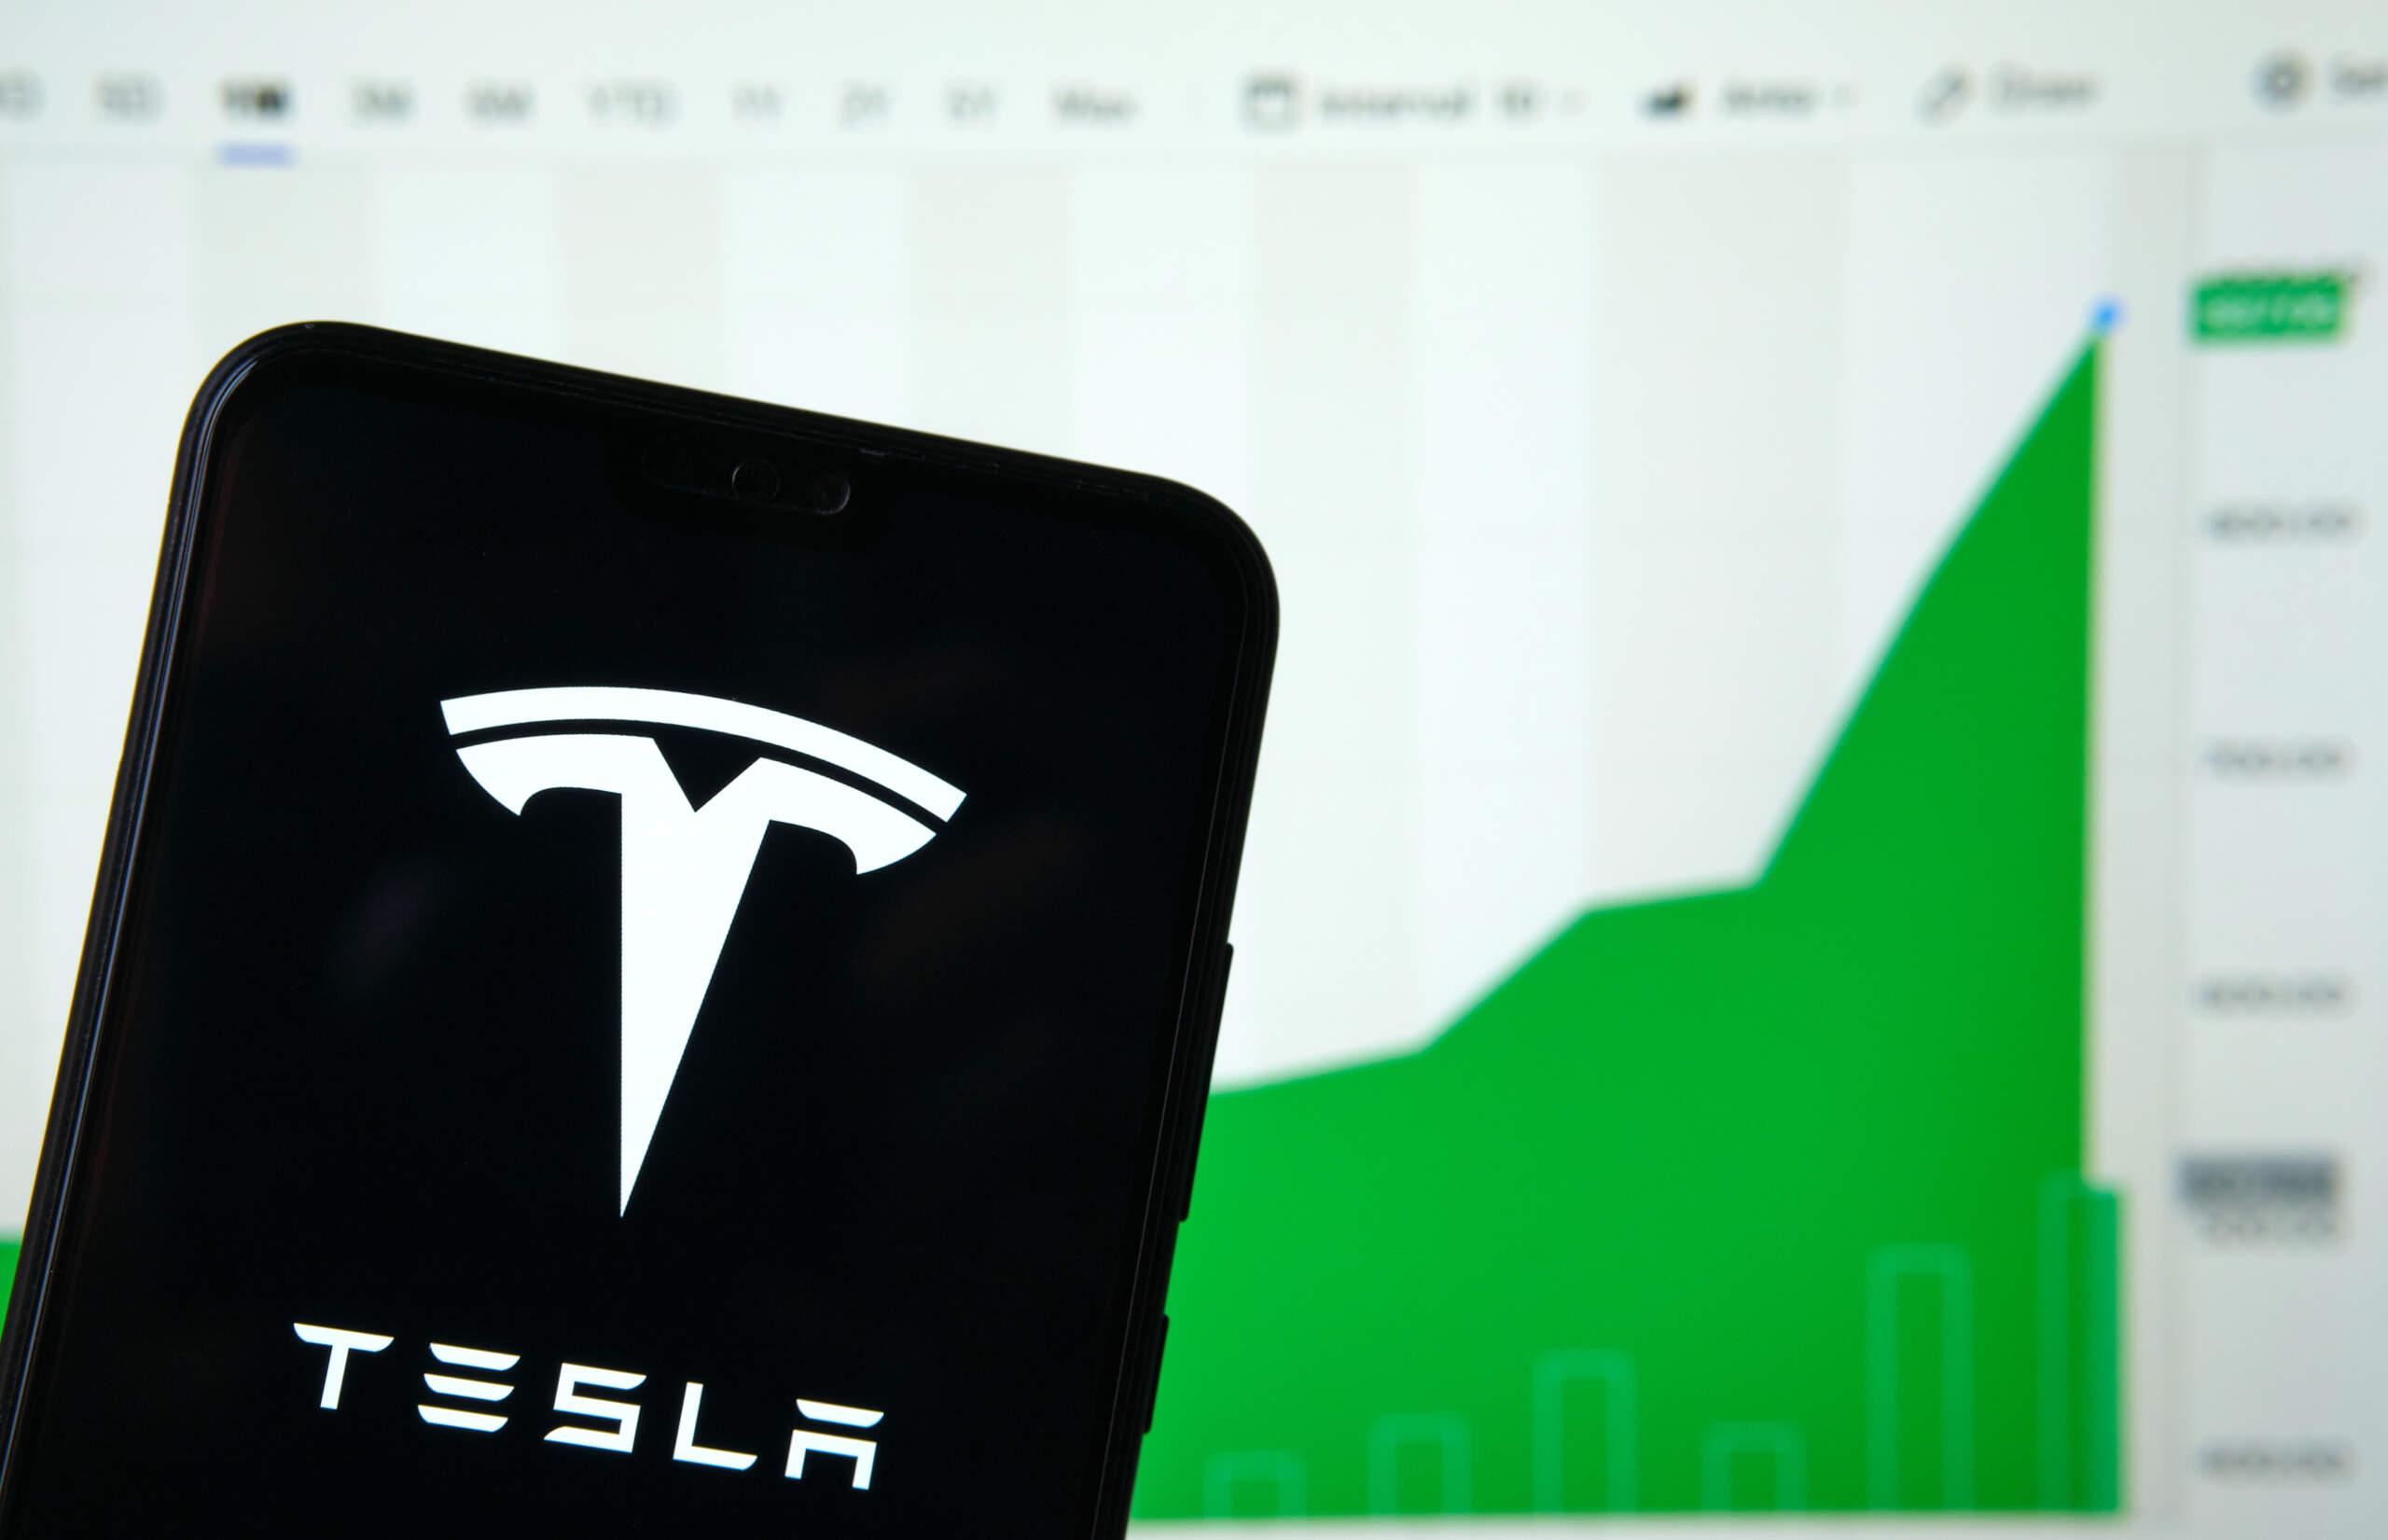 Elon Musk To Make $1.8 Billion On Friday?